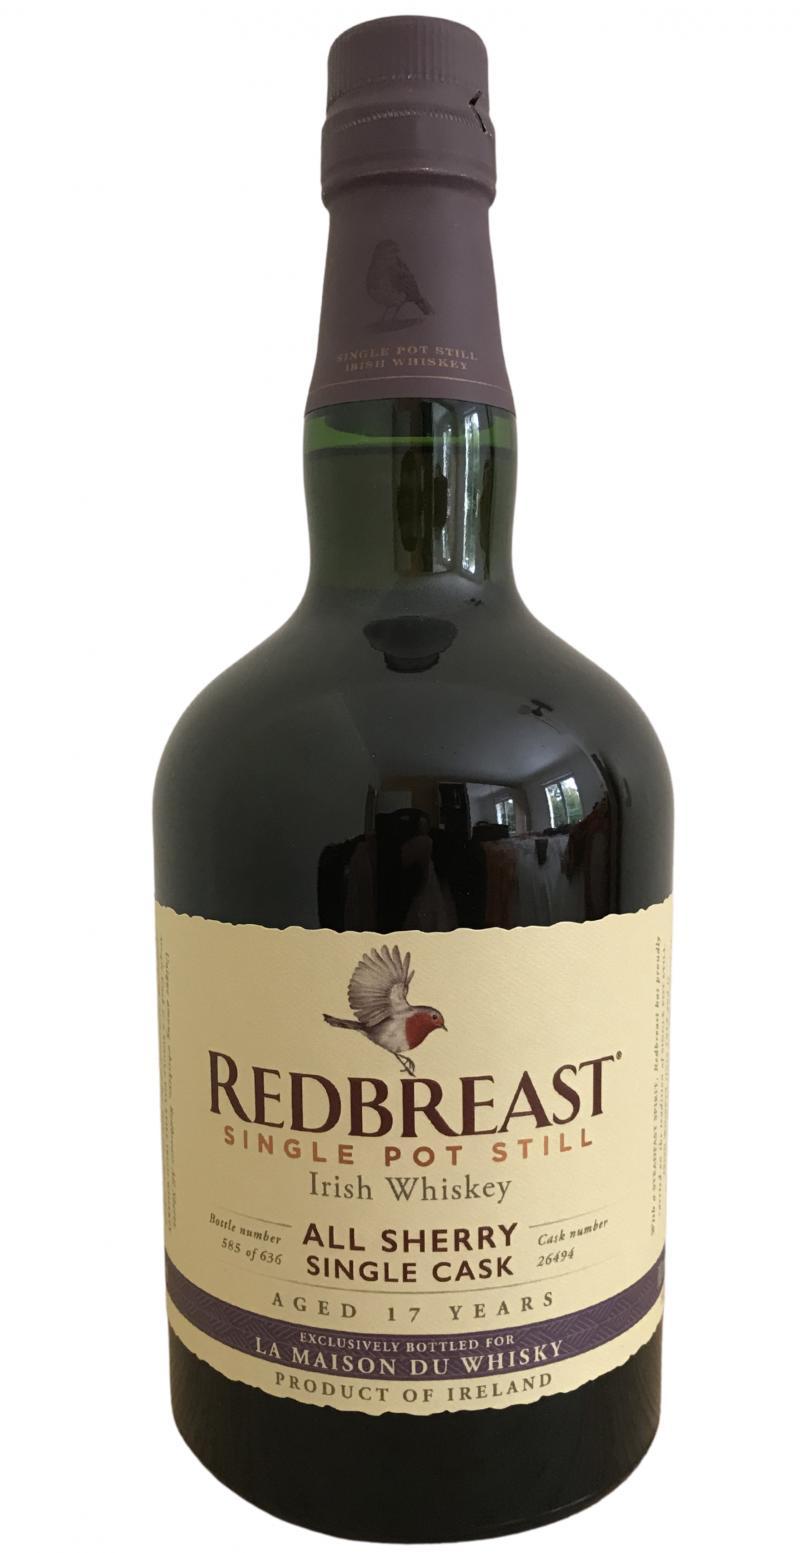 Redbreast 2001